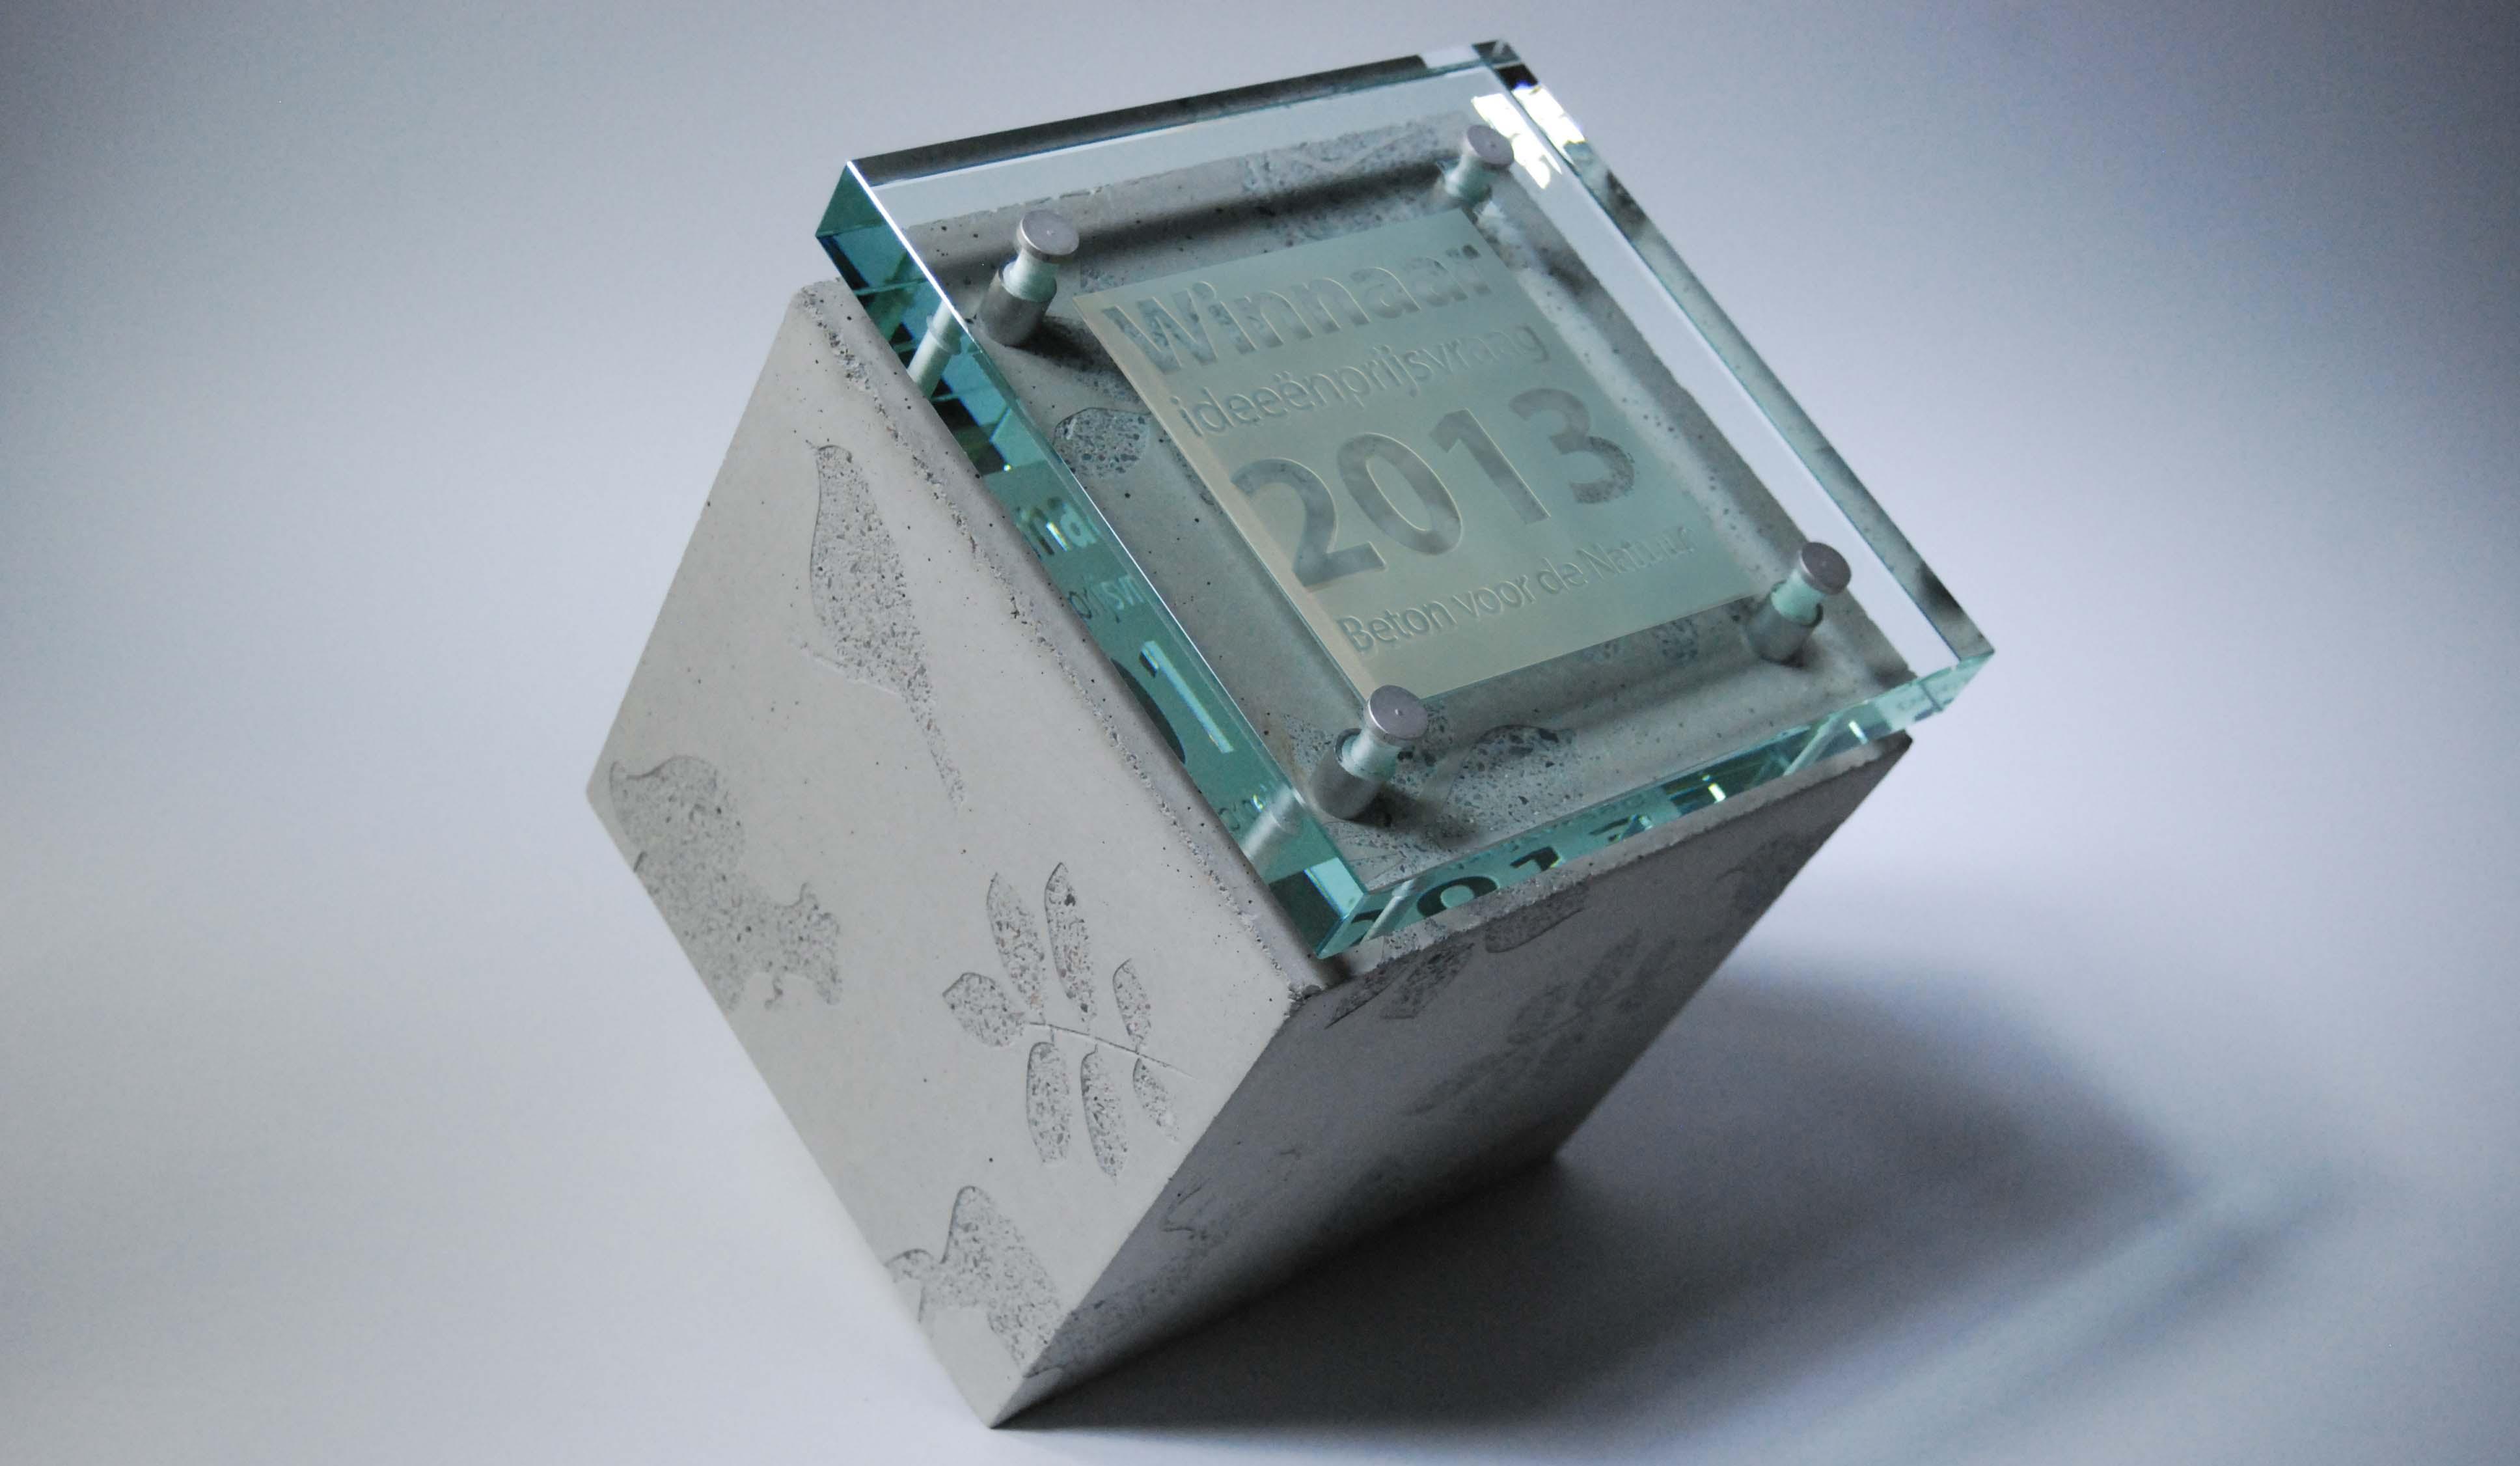 AWARDS: Groen Beton Award